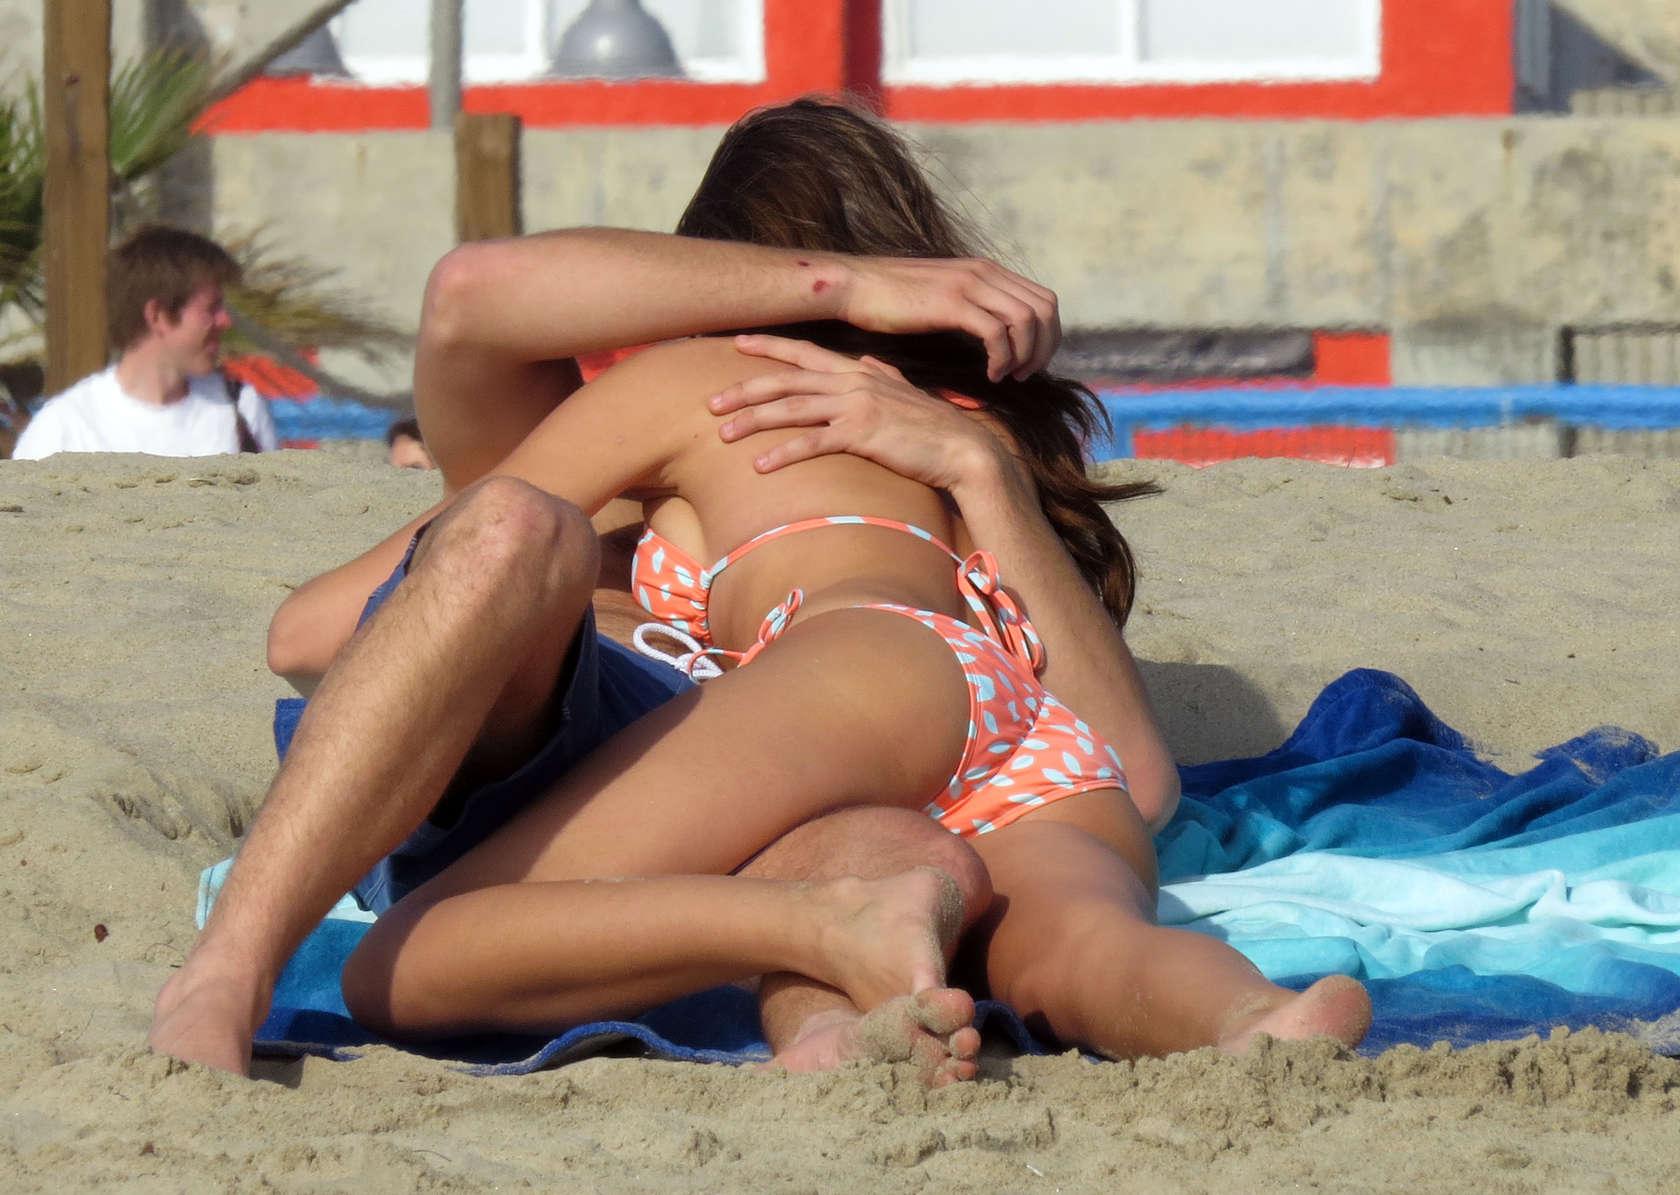 Odette yustman bikini pics